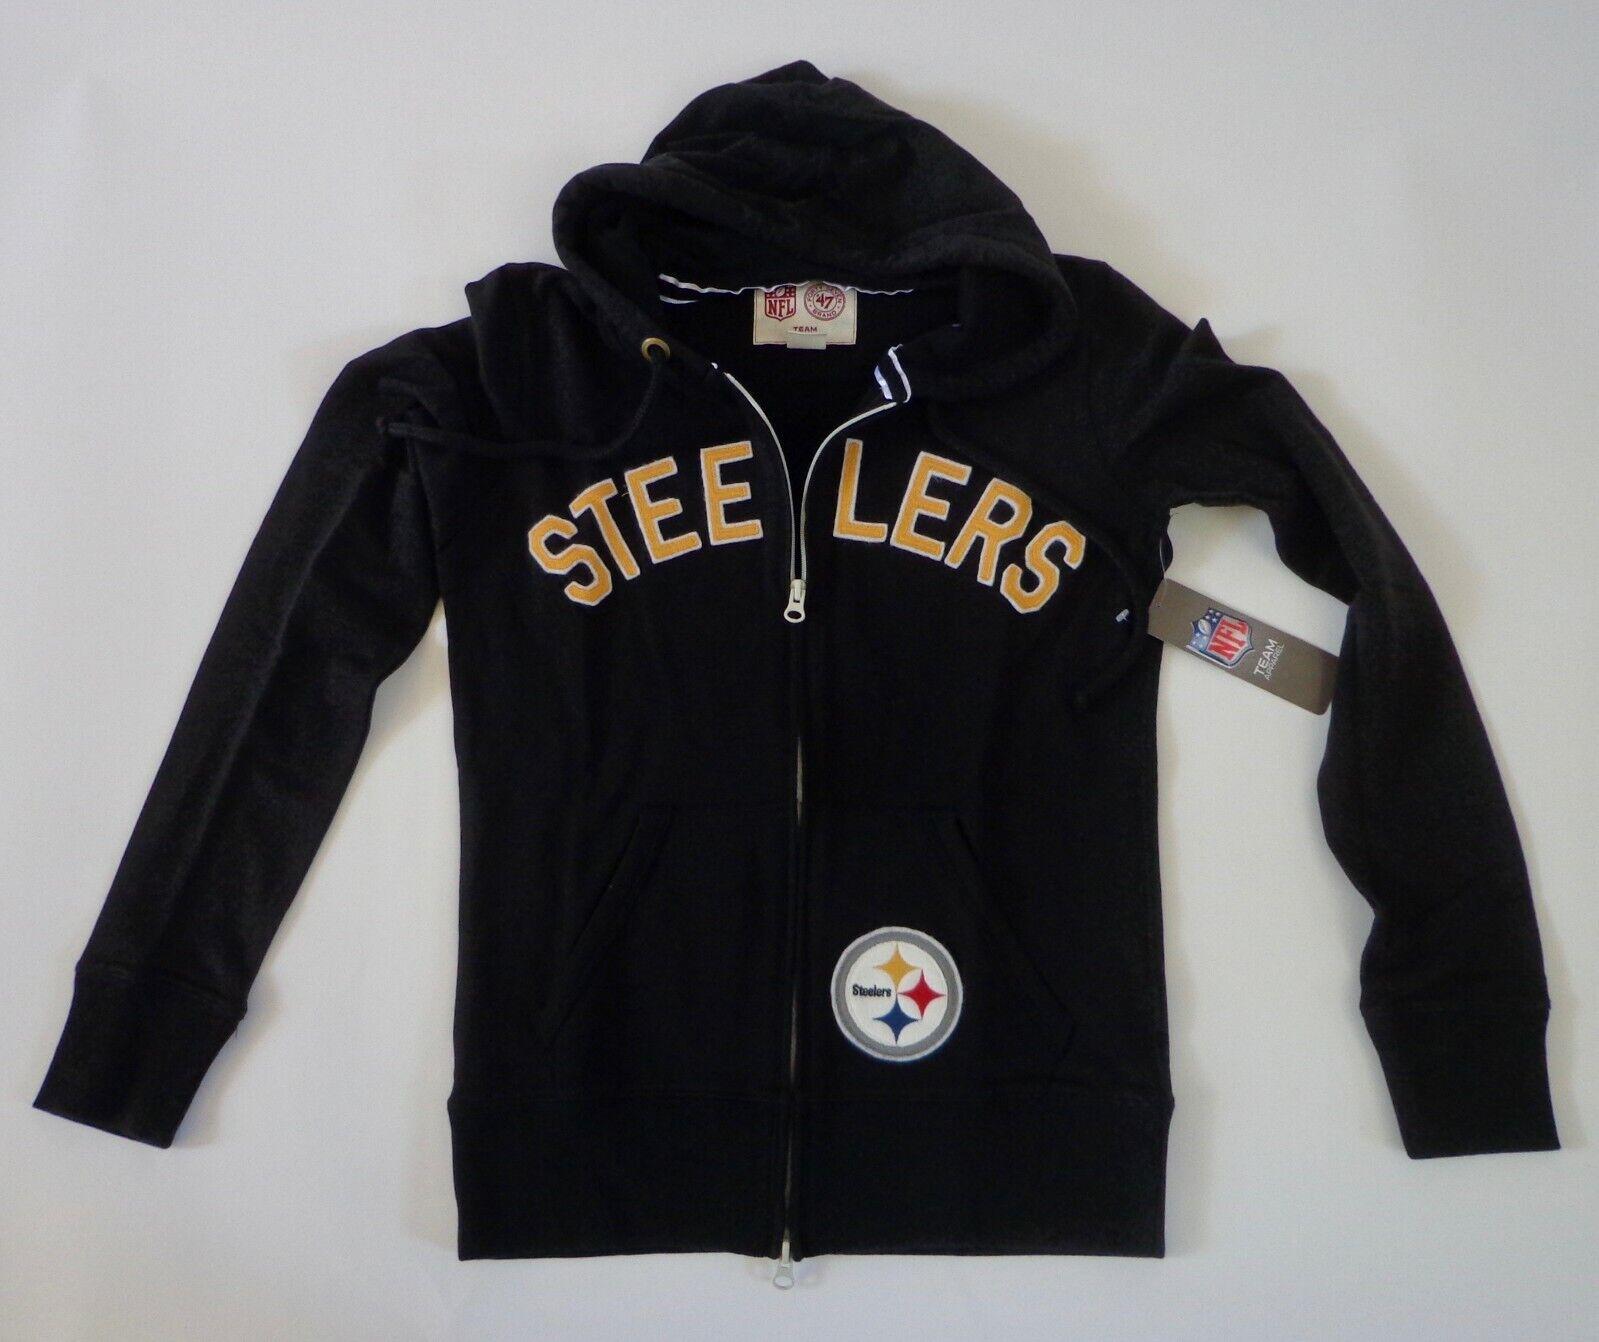 2f7275e0 Steelers Pittsburgh Small Women's Zip Full Hoodie Brand '47 ...